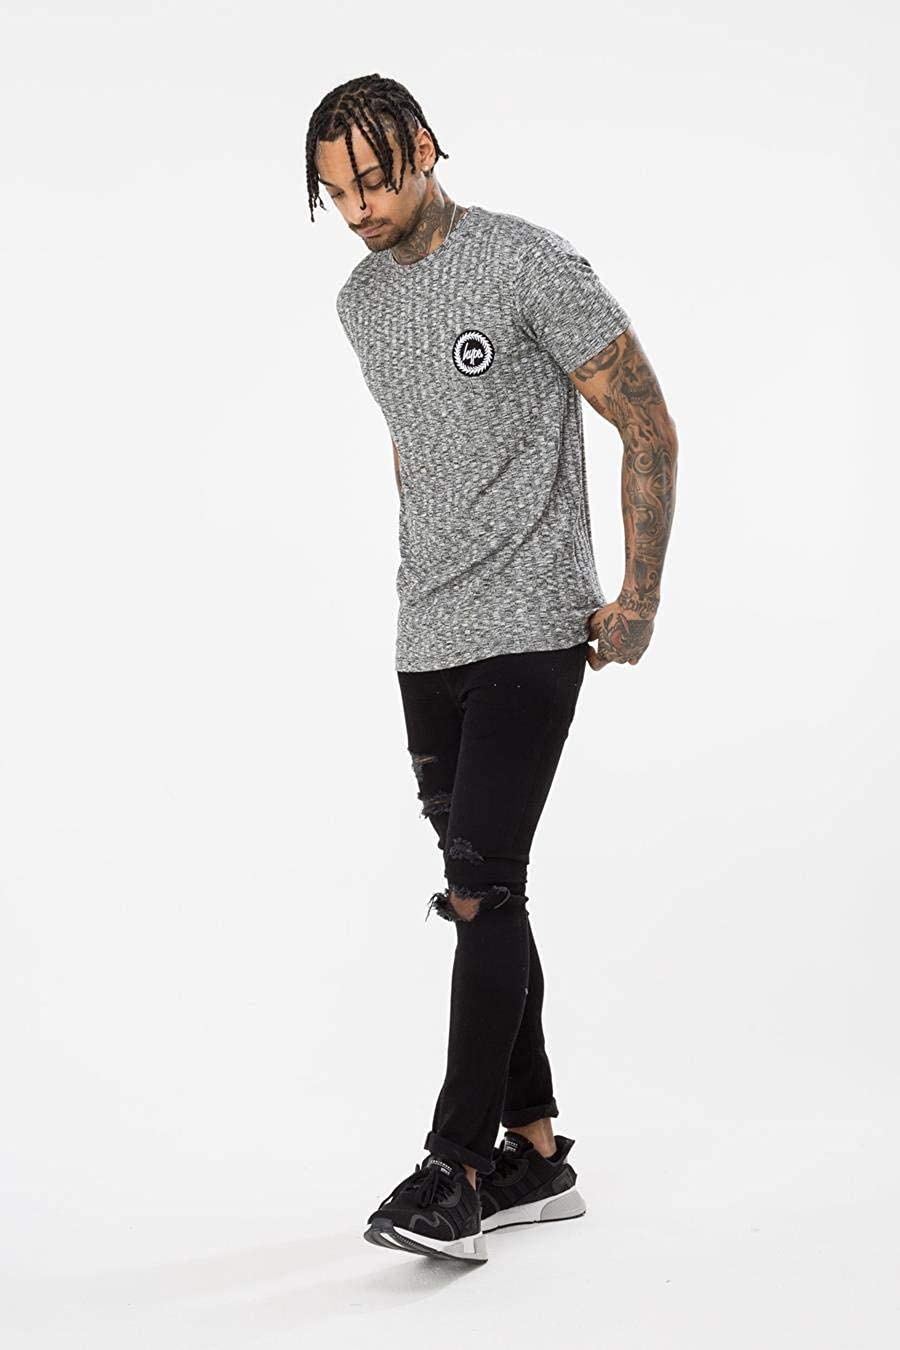 Hype Grey Rib Crest Mens T-Shirt